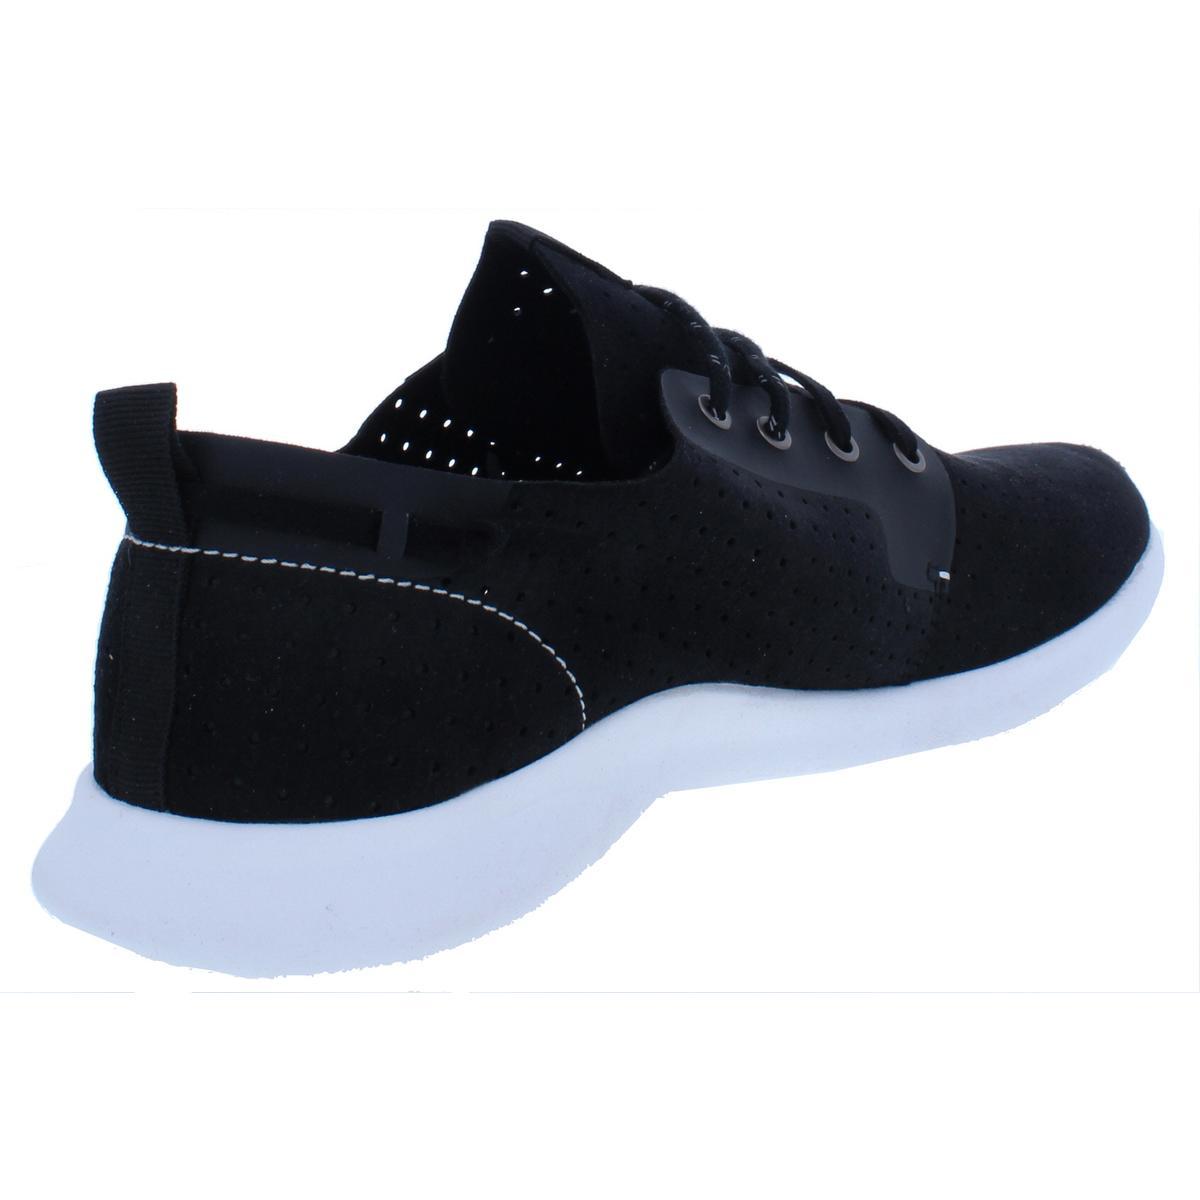 Steve-Madden-Men-039-s-Brick-Faux-Suede-Athletic-Fashion-Sneaker-Trainers-Shoes thumbnail 4